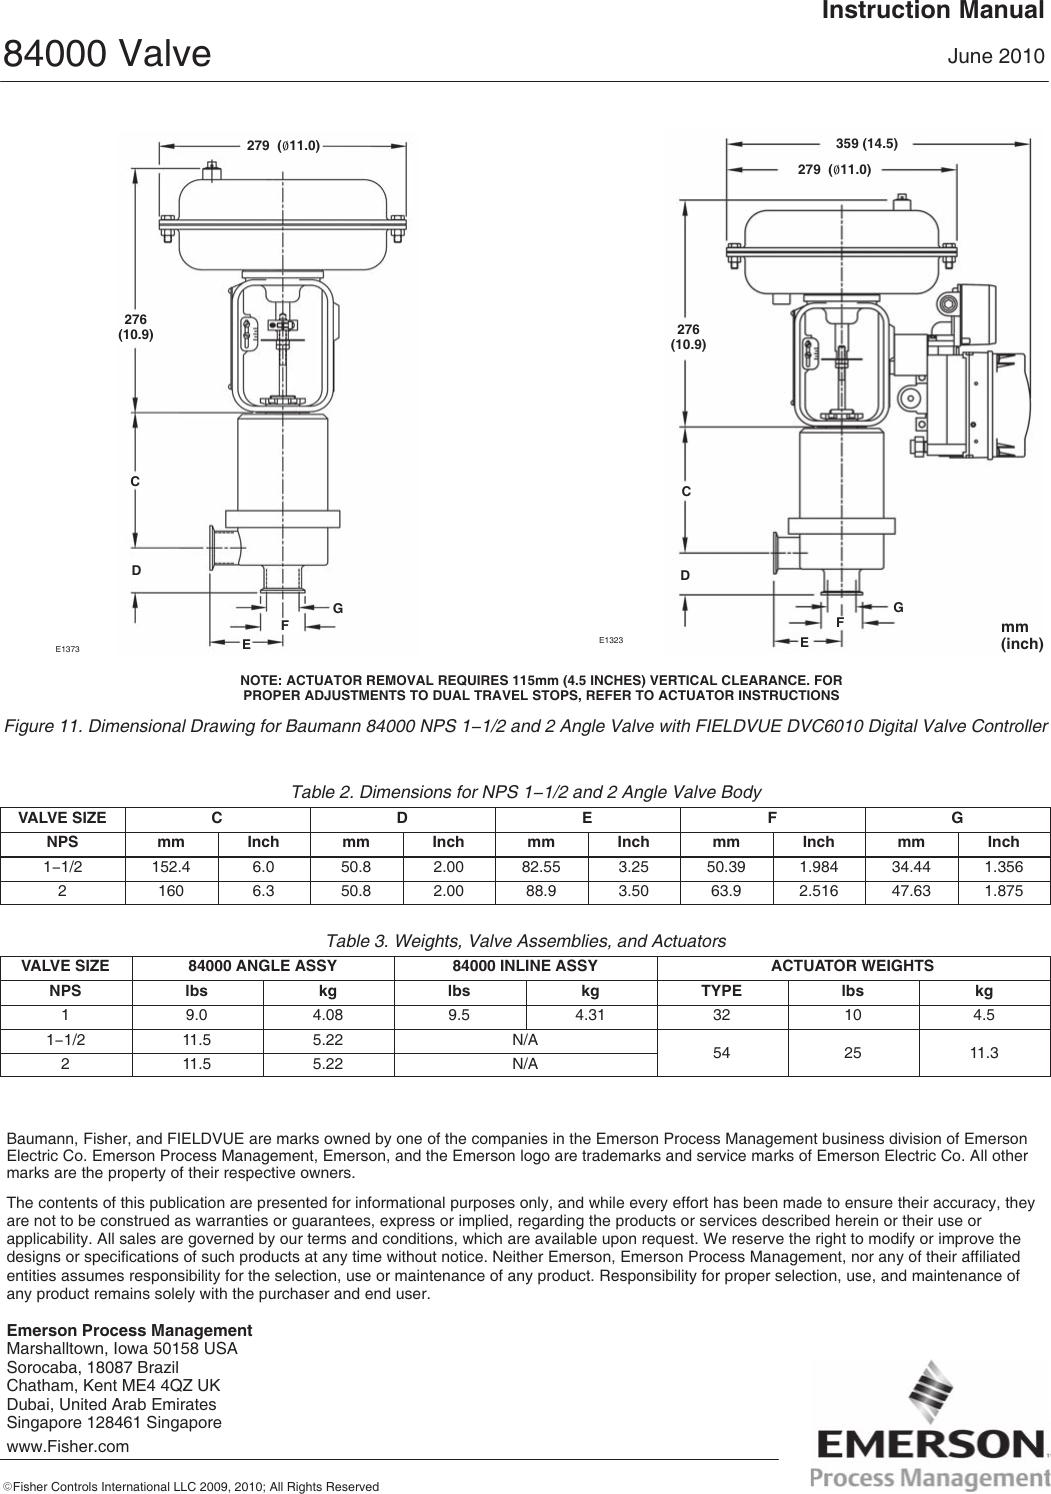 Emerson Fisher Baumann 84000 Instruction Manual